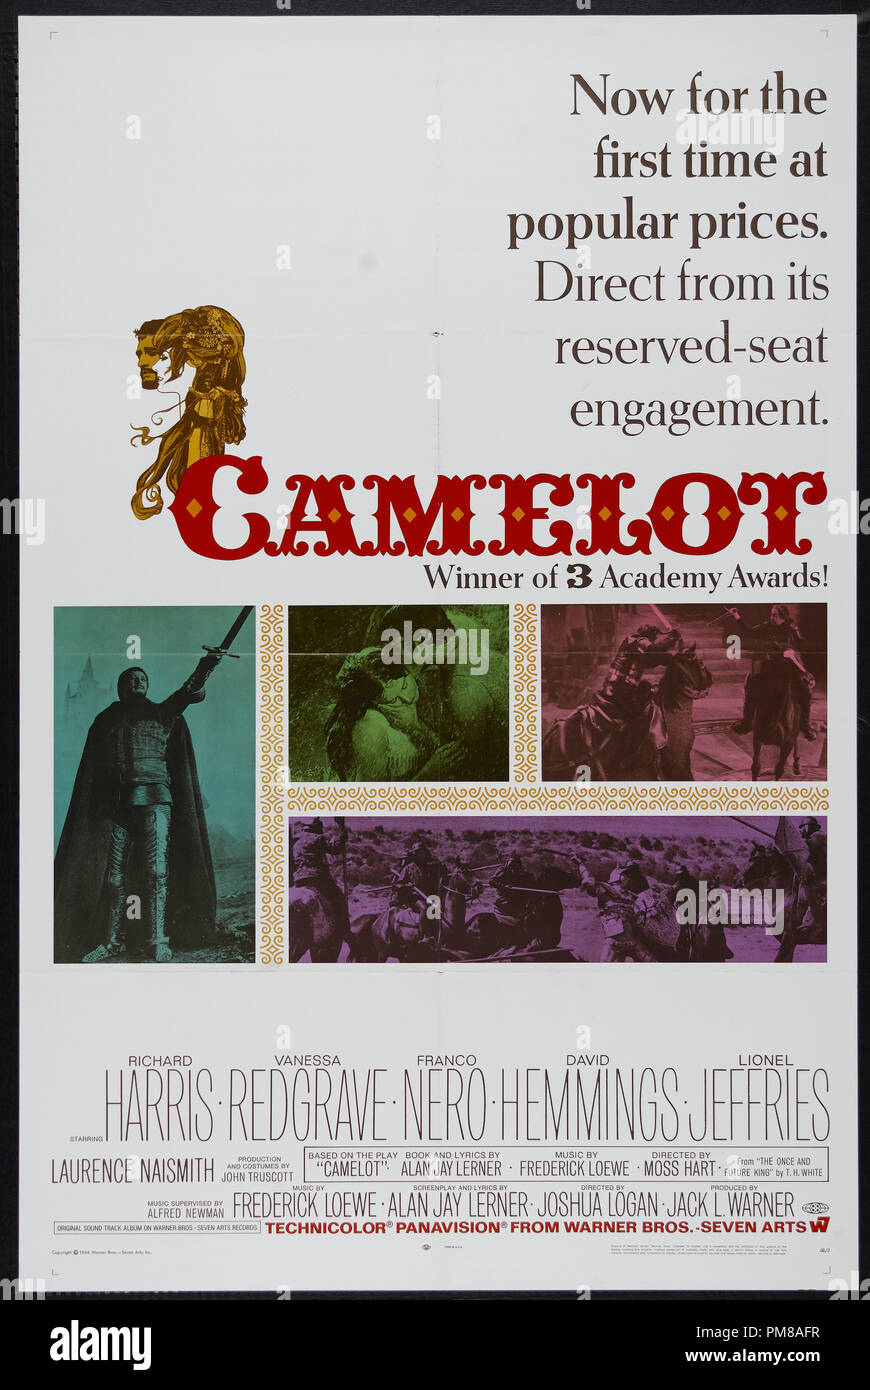 Camelot Film Stock Photos & Camelot Film Stock Images - Alamy